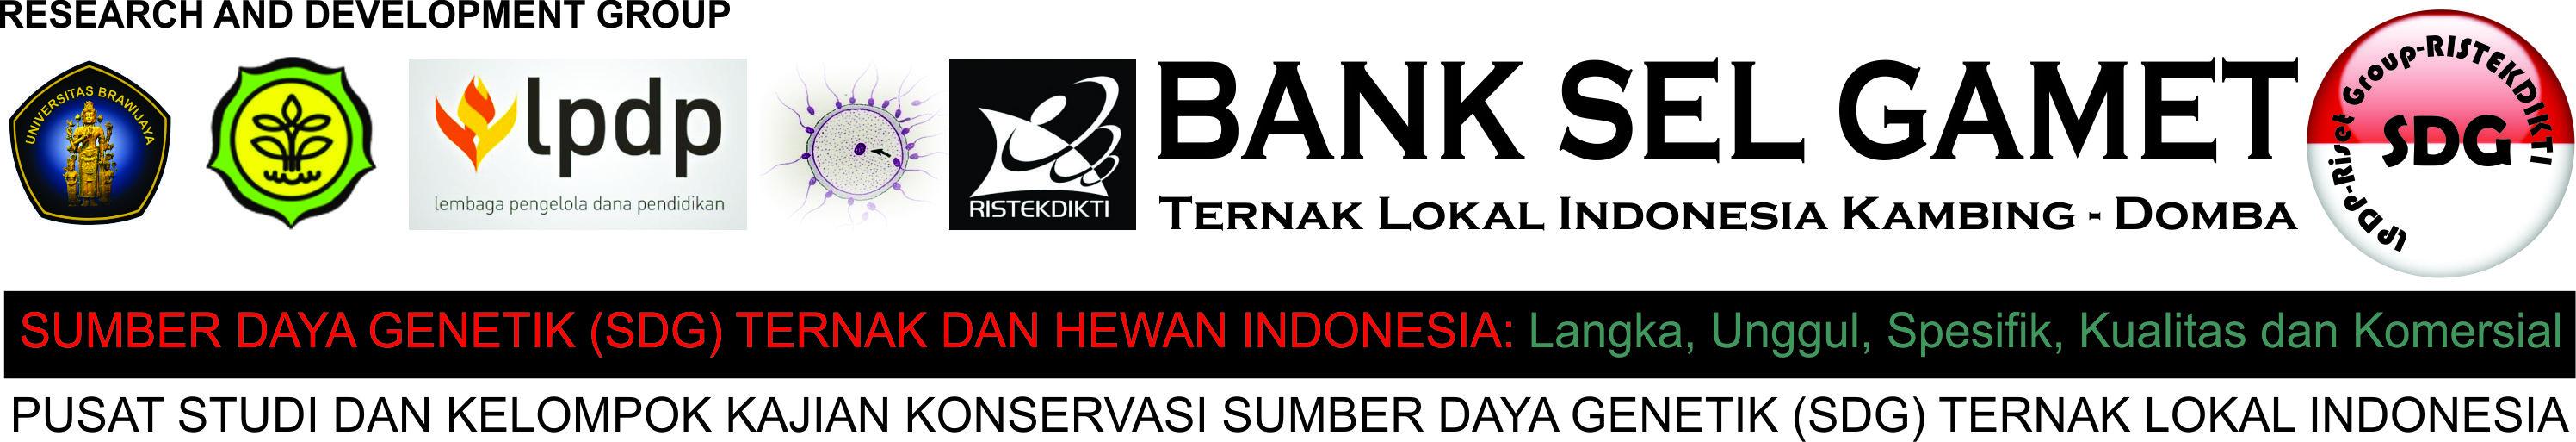 Bank Sel Gamet Ternak Lokal Indonesia Kambing Domba Logo